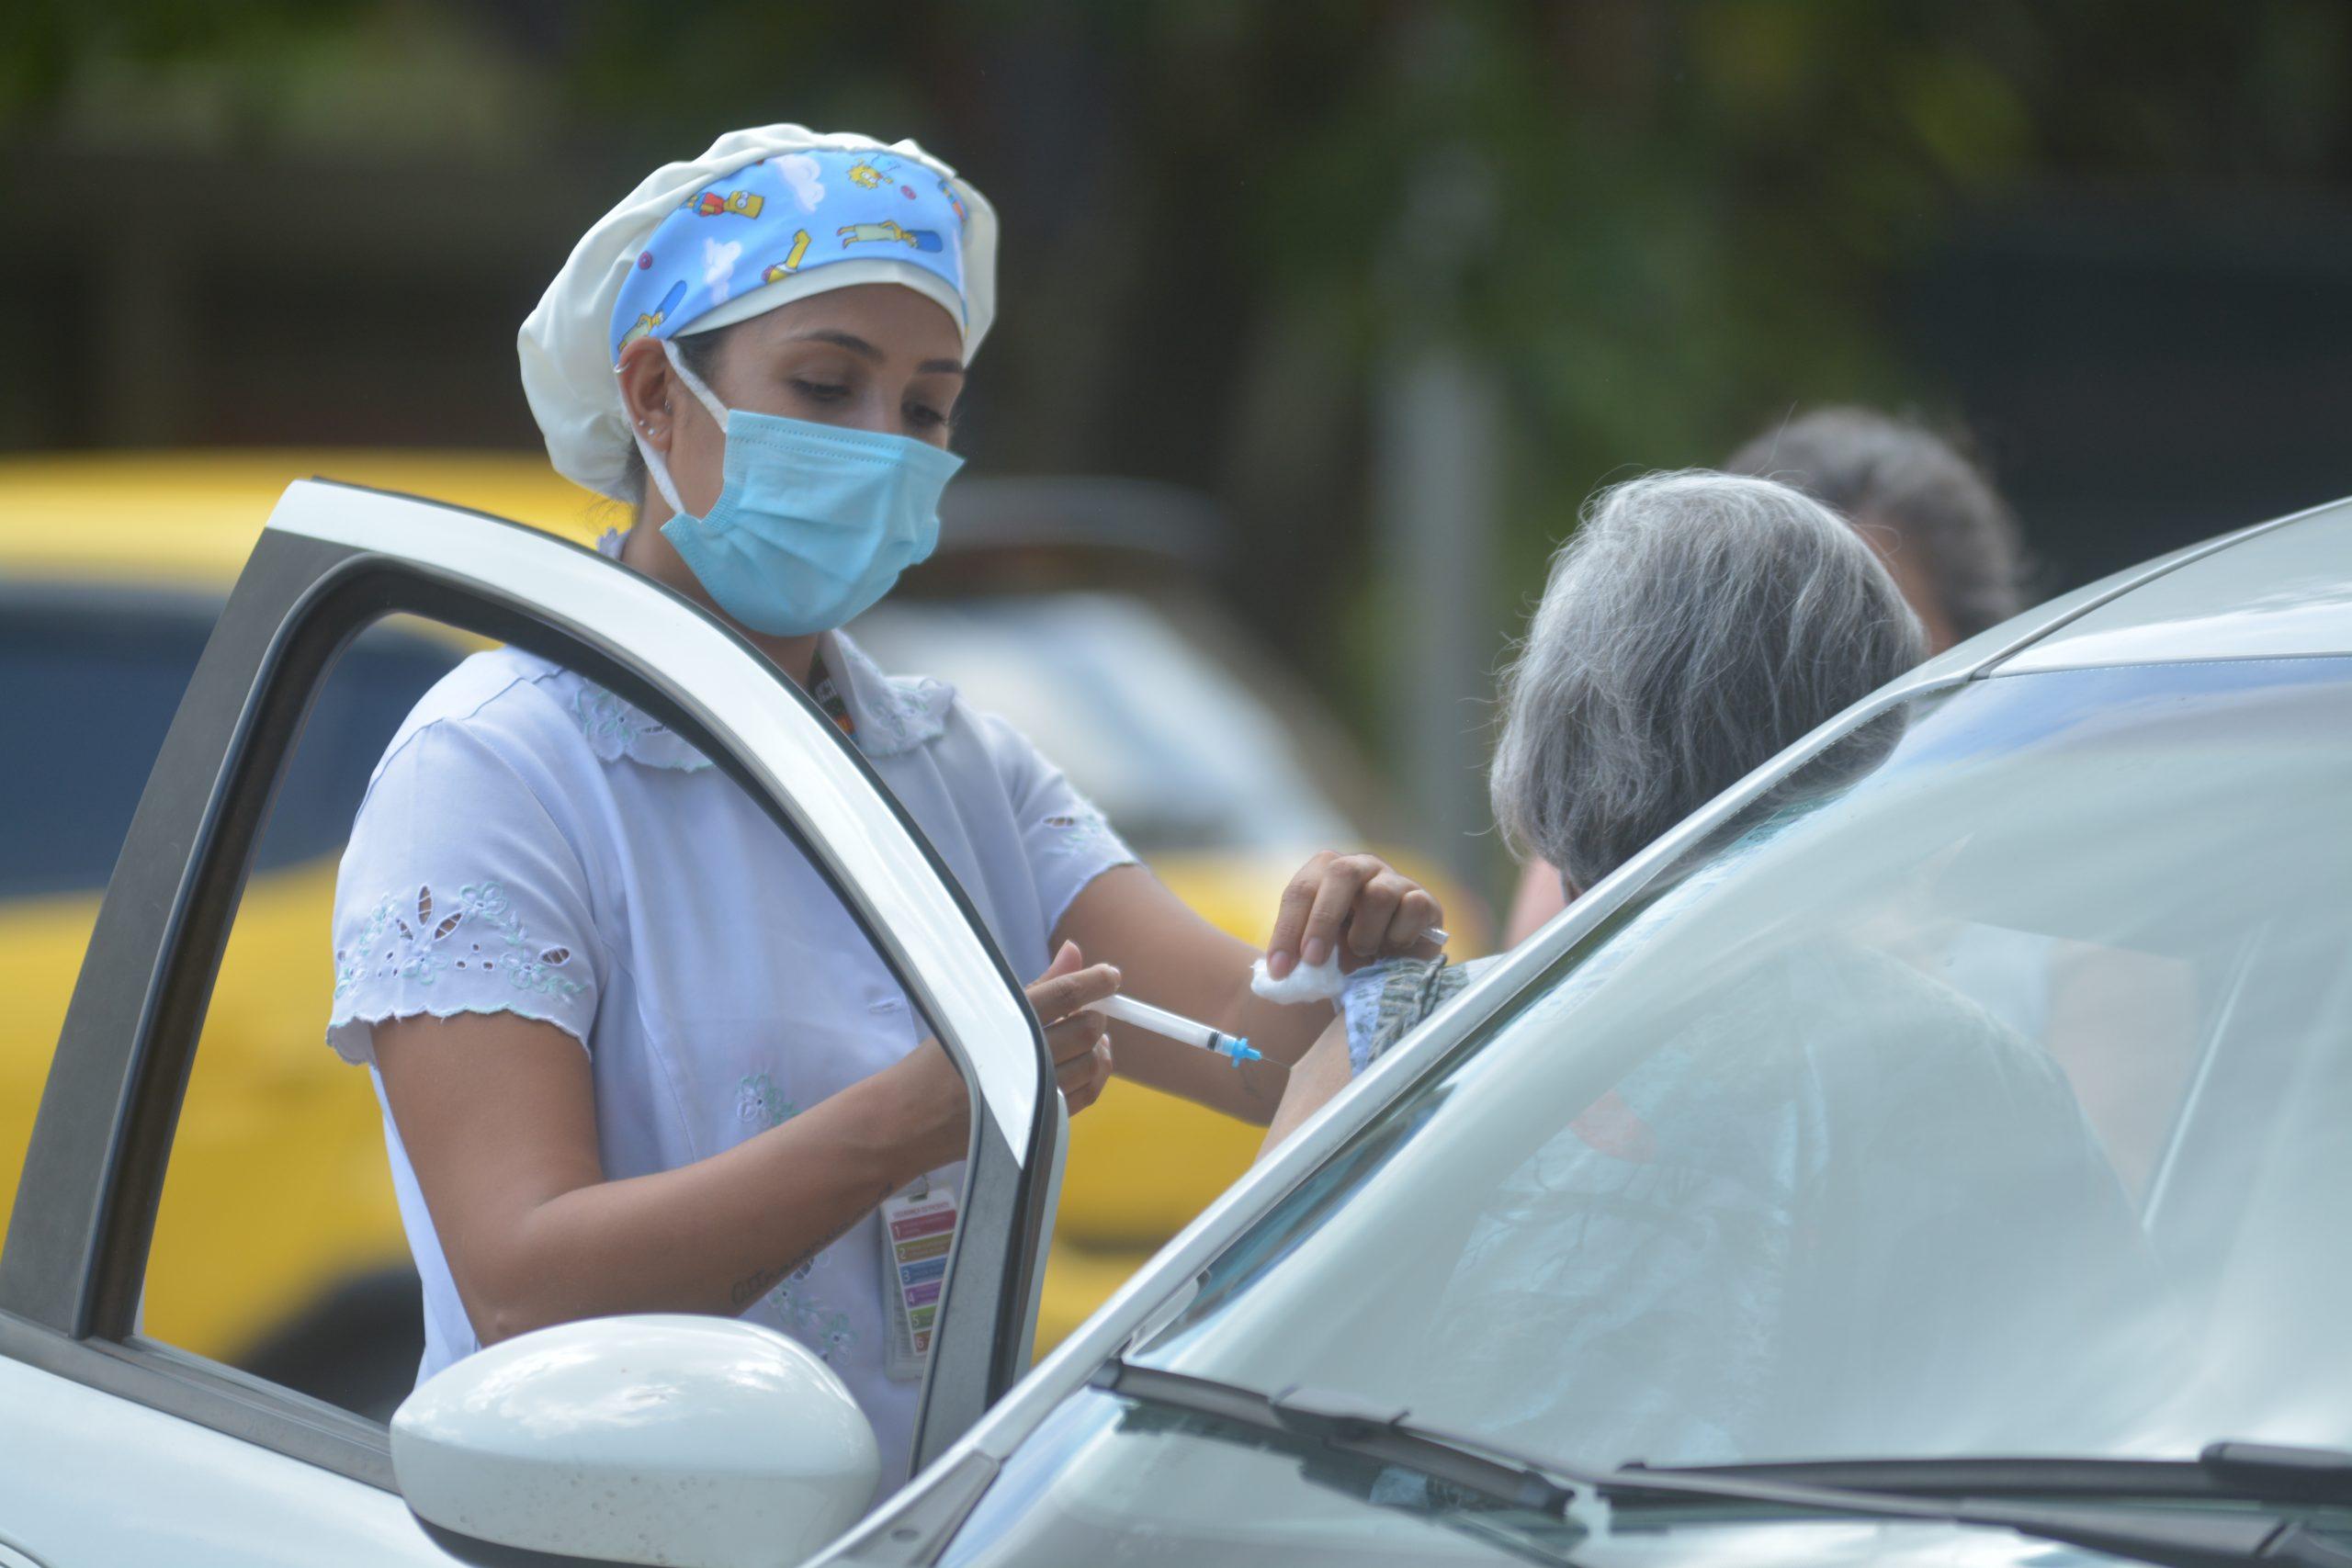 Drive-thru vacina idosos acima de 80 anos. Foto: Vítor Mendonça/Jornal de Brasília